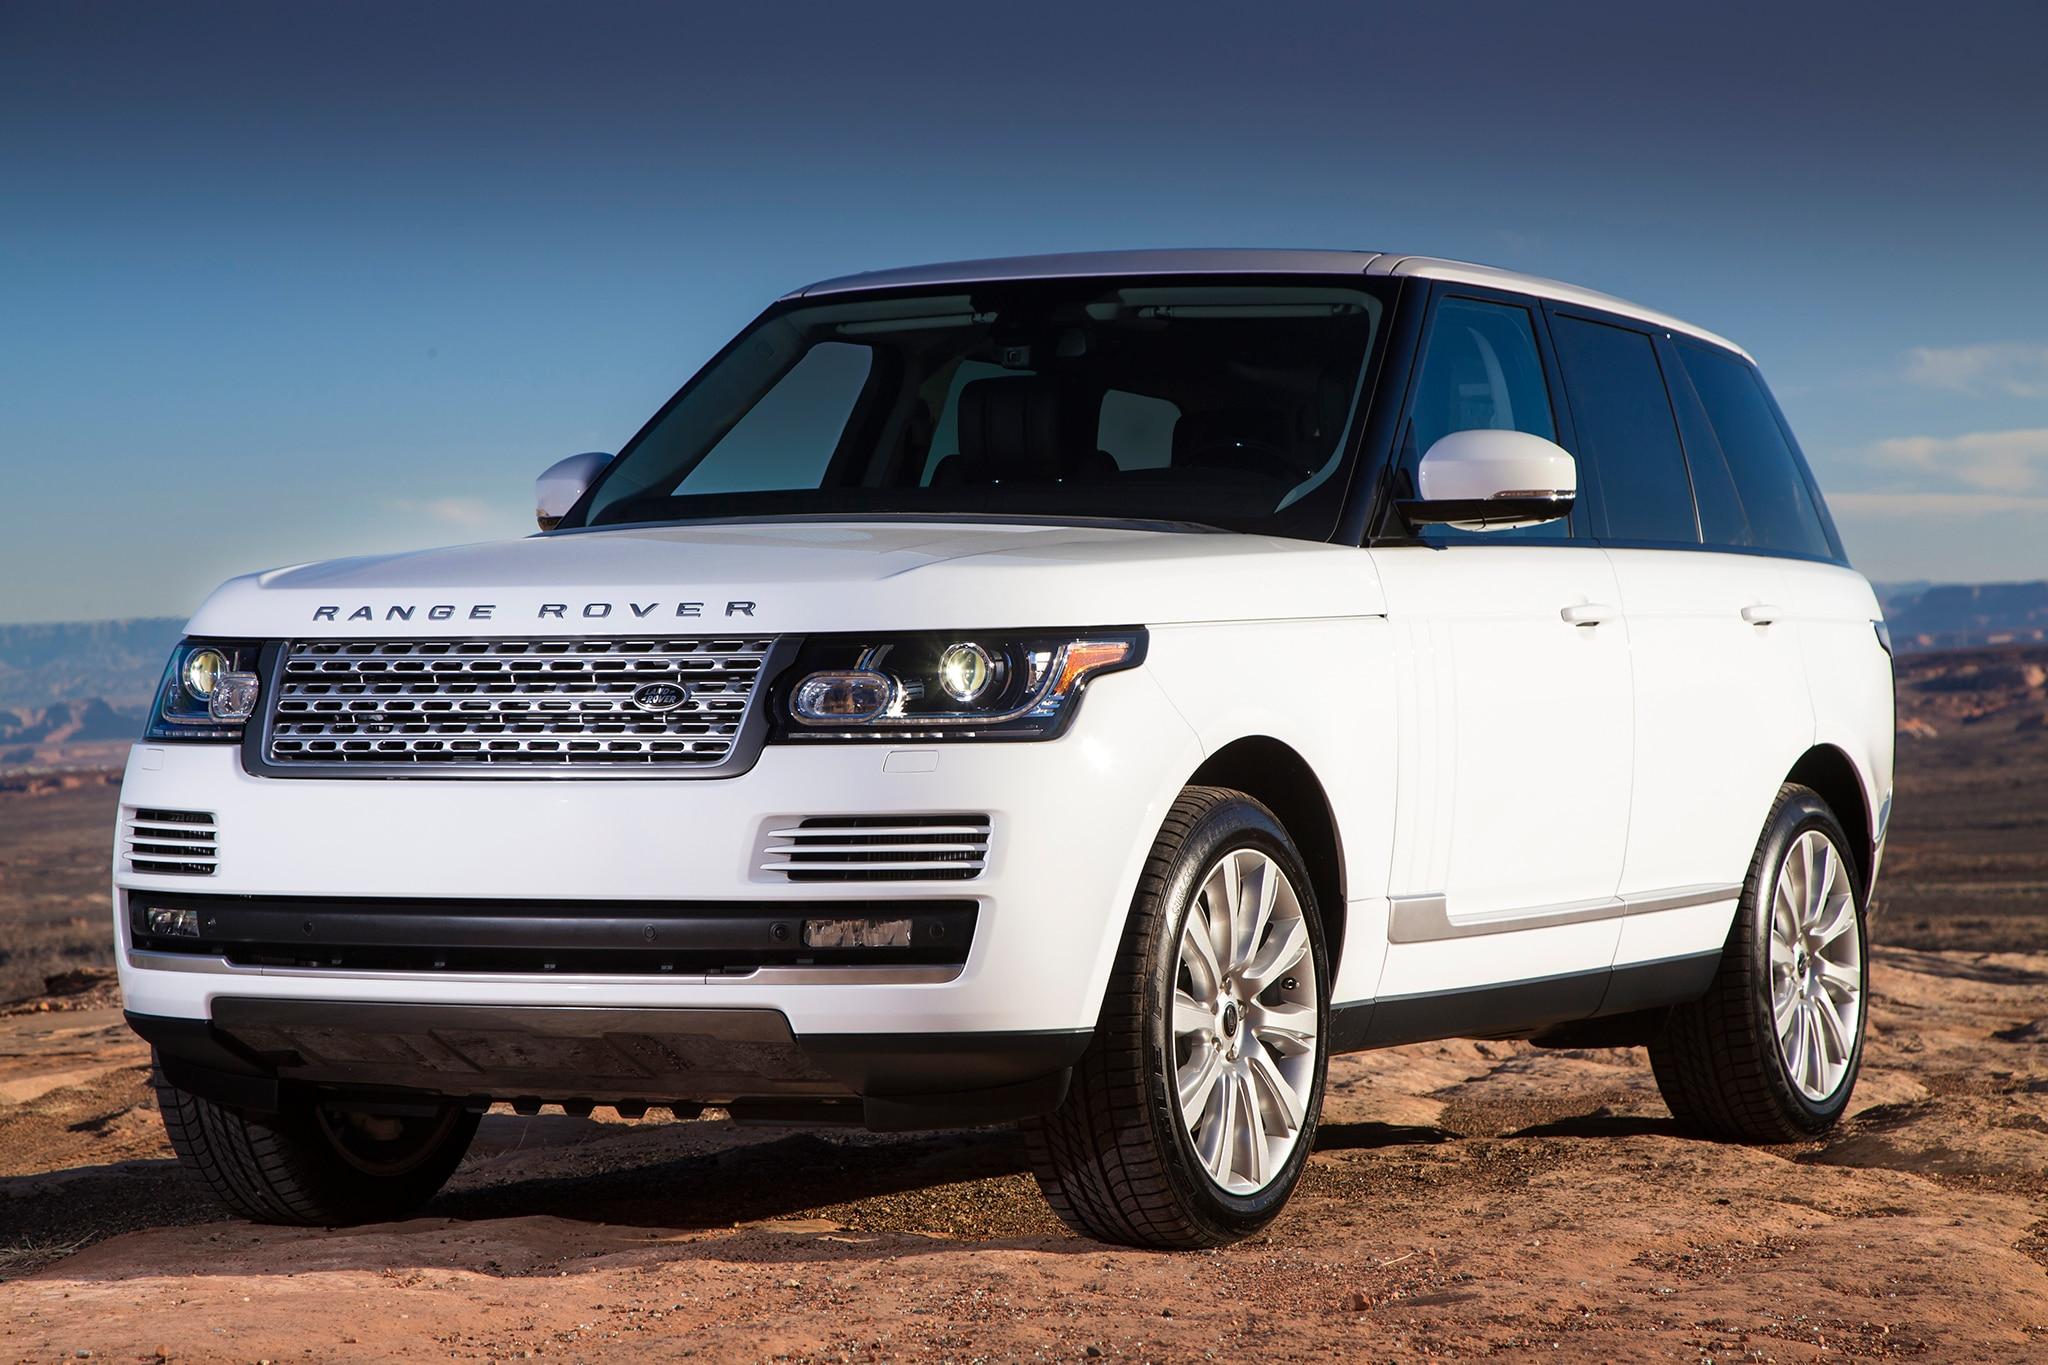 https://st.automobilemag.com/uploads/sites/10/2015/09/2013-land-rover-range-rover-three-quarters-view-7.jpg